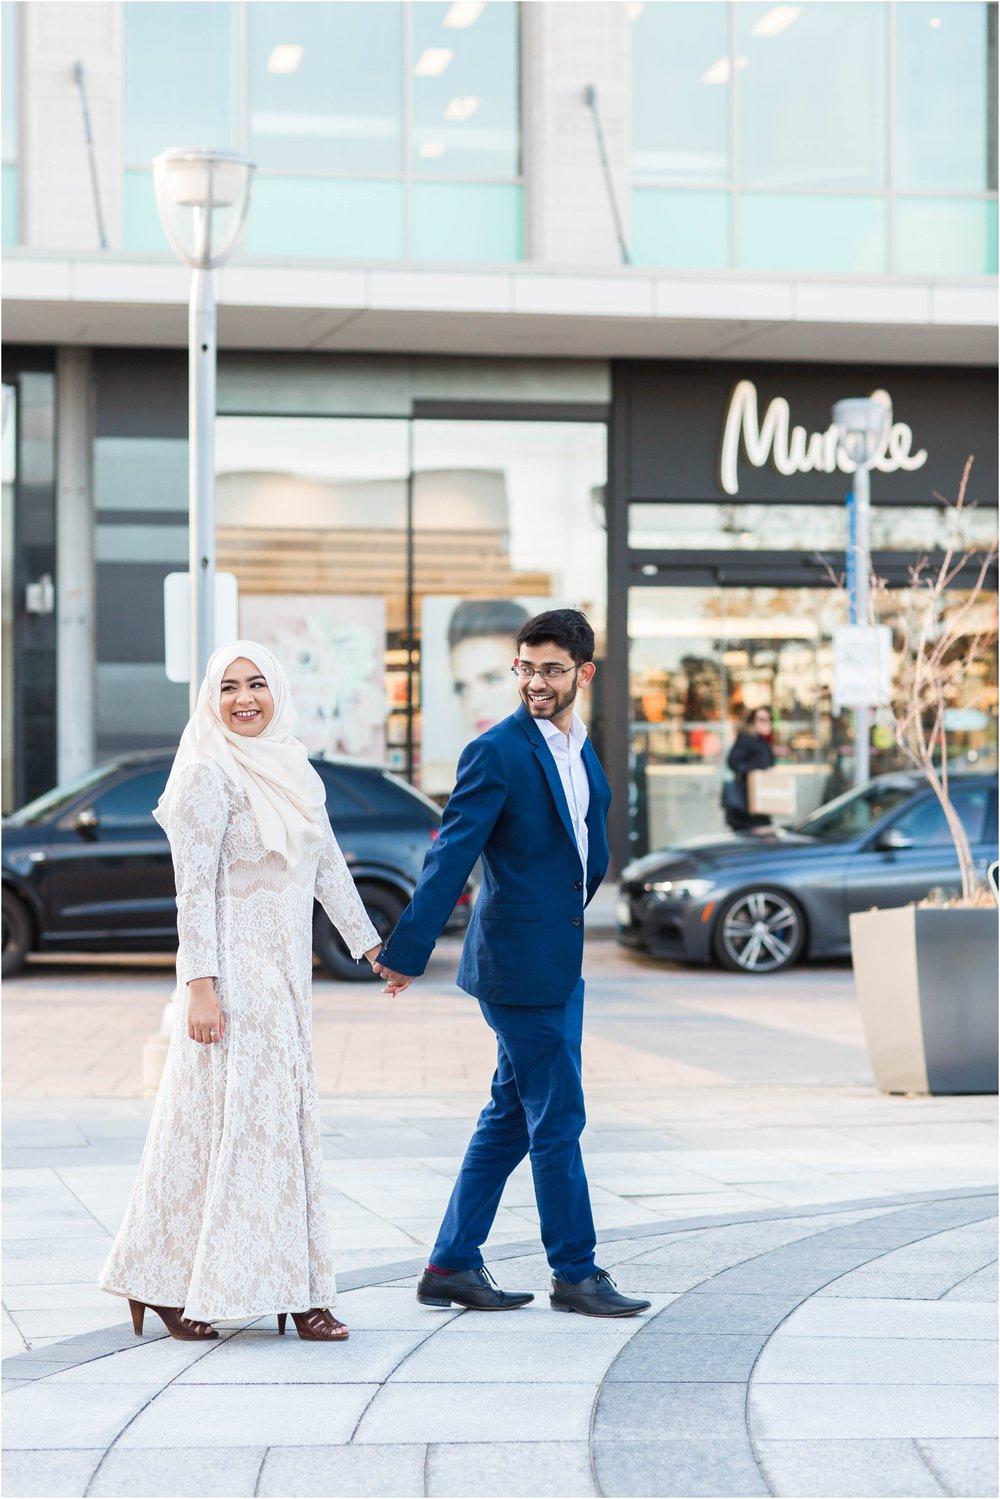 Shops-at-Don-Mills-Engagement-Session-Toronto-Mississauga-Brampton-Scarborough-GTA-Pakistani-Indian-Wedding-Engagement-Photographer-Photography_0013.jpg